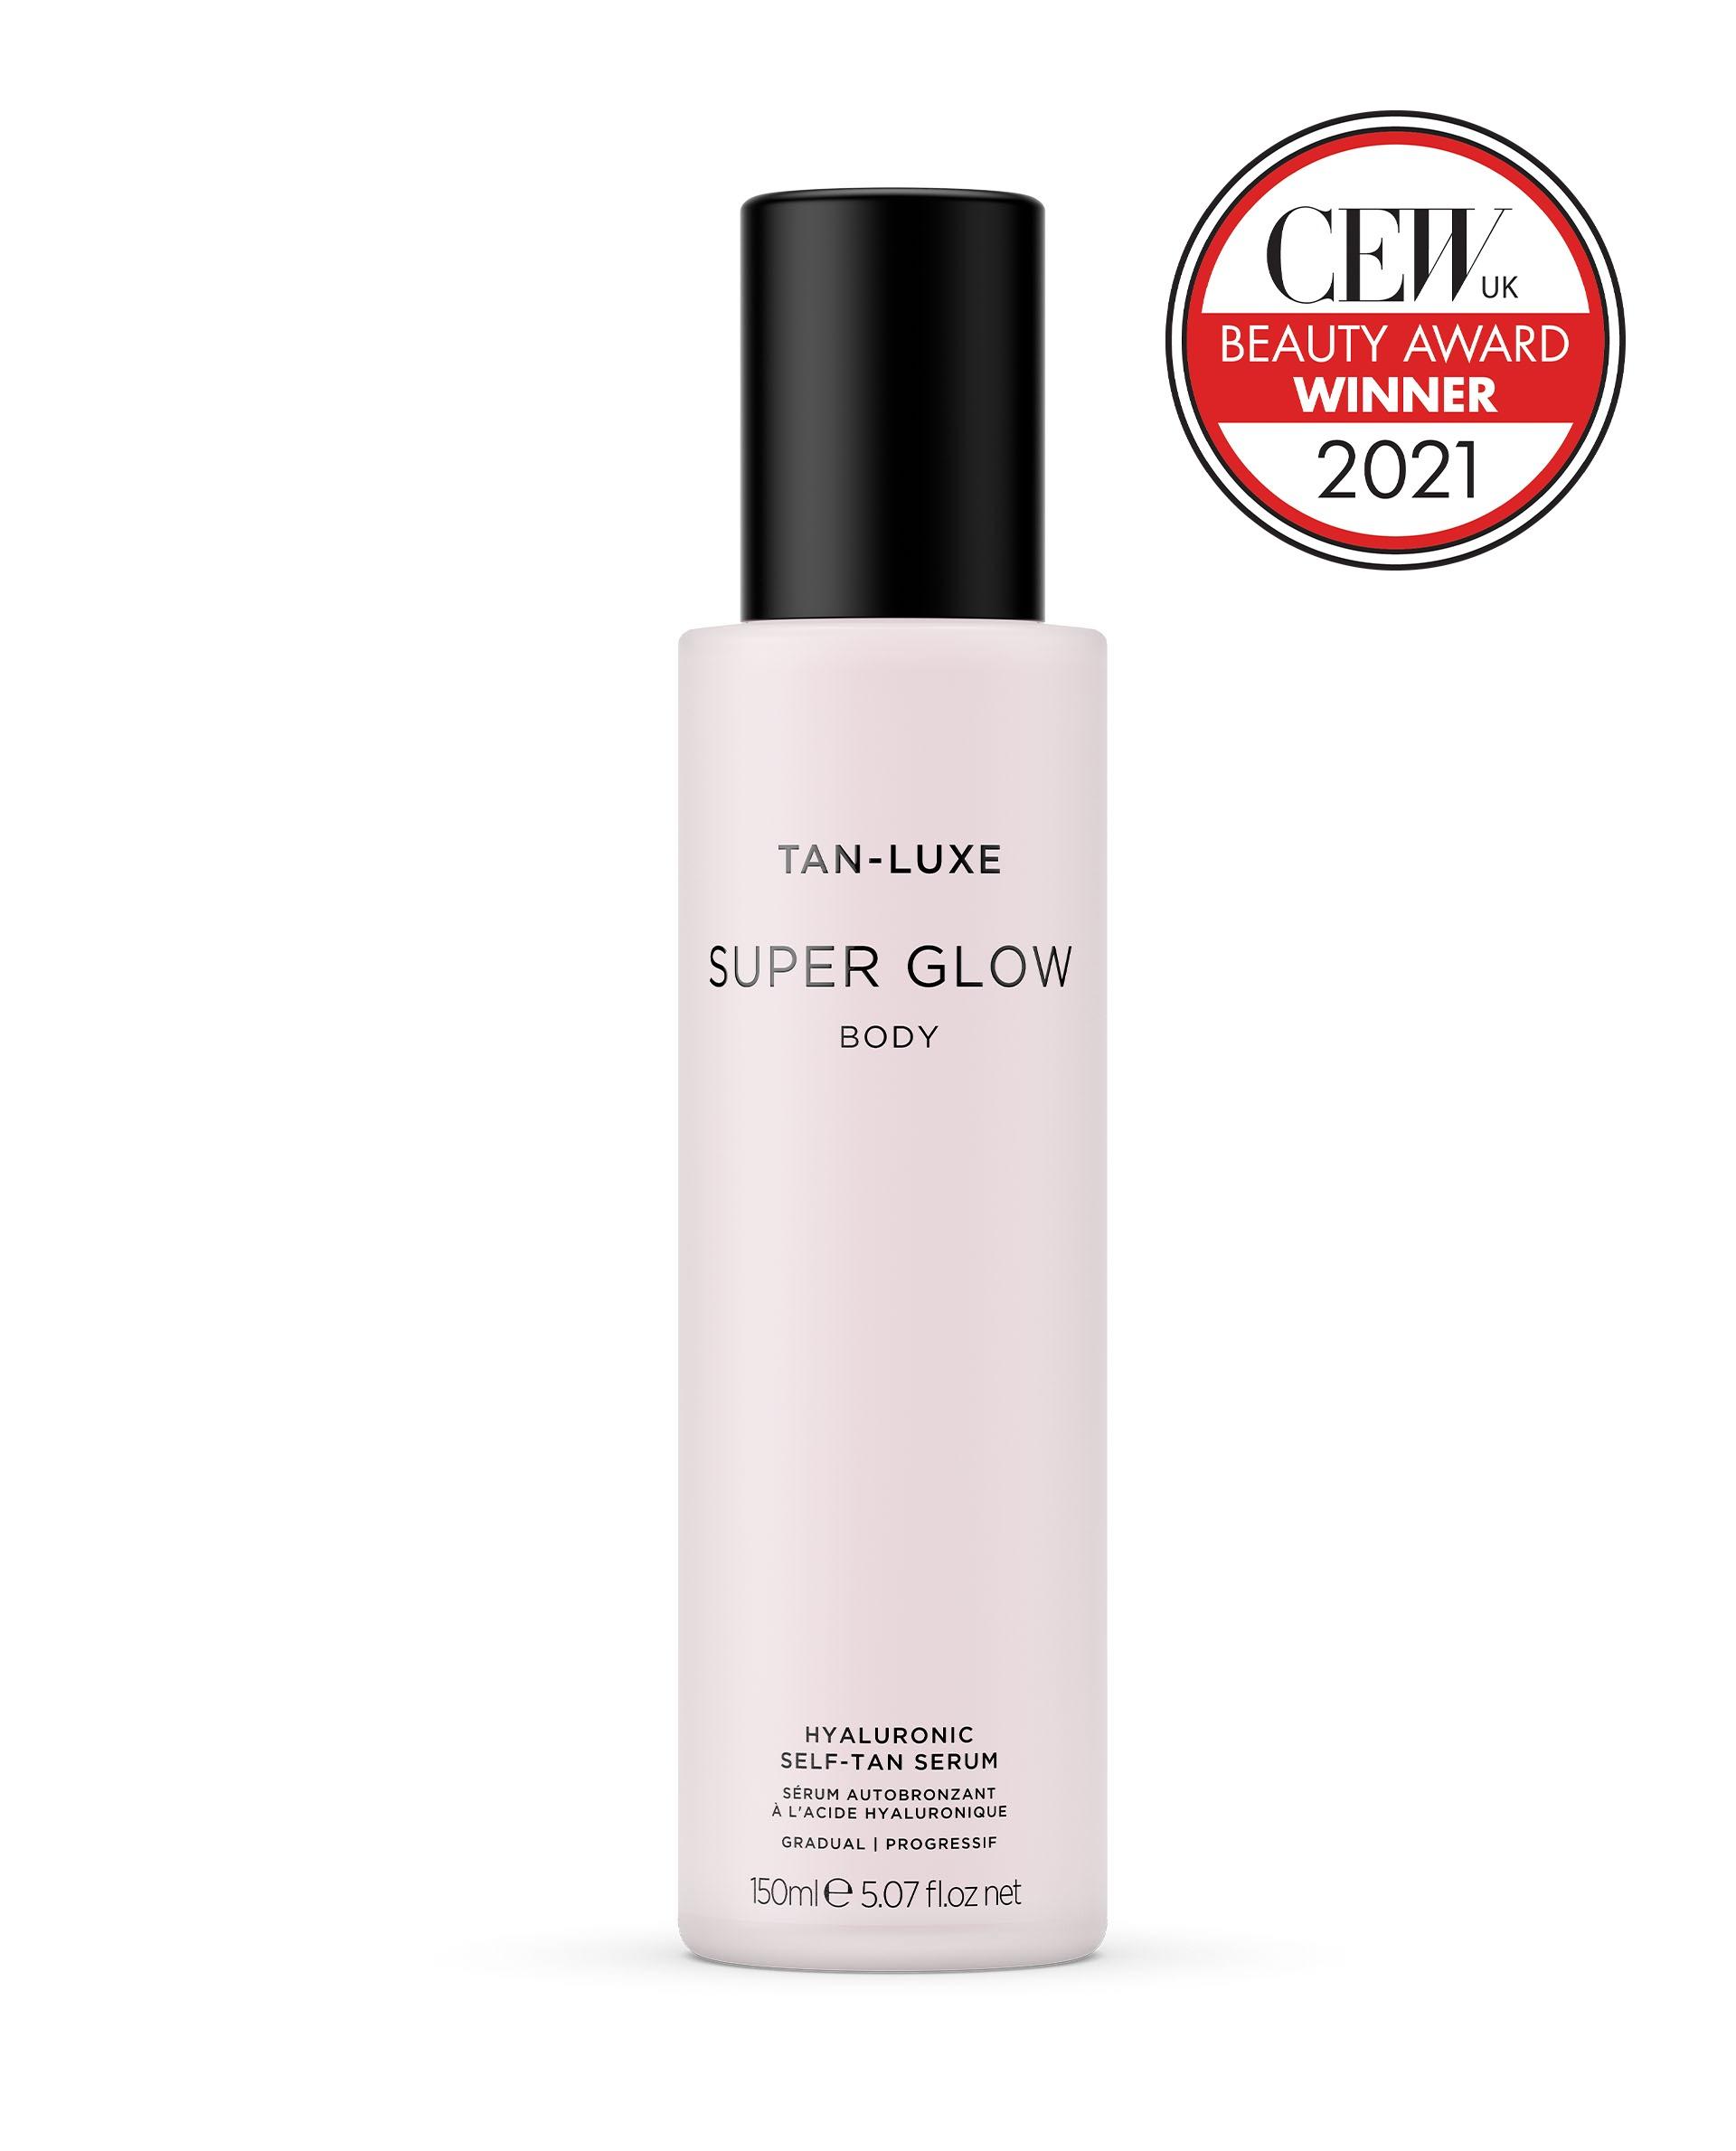 _0000_TanLuxe Super Glow 150ml Bottle Render